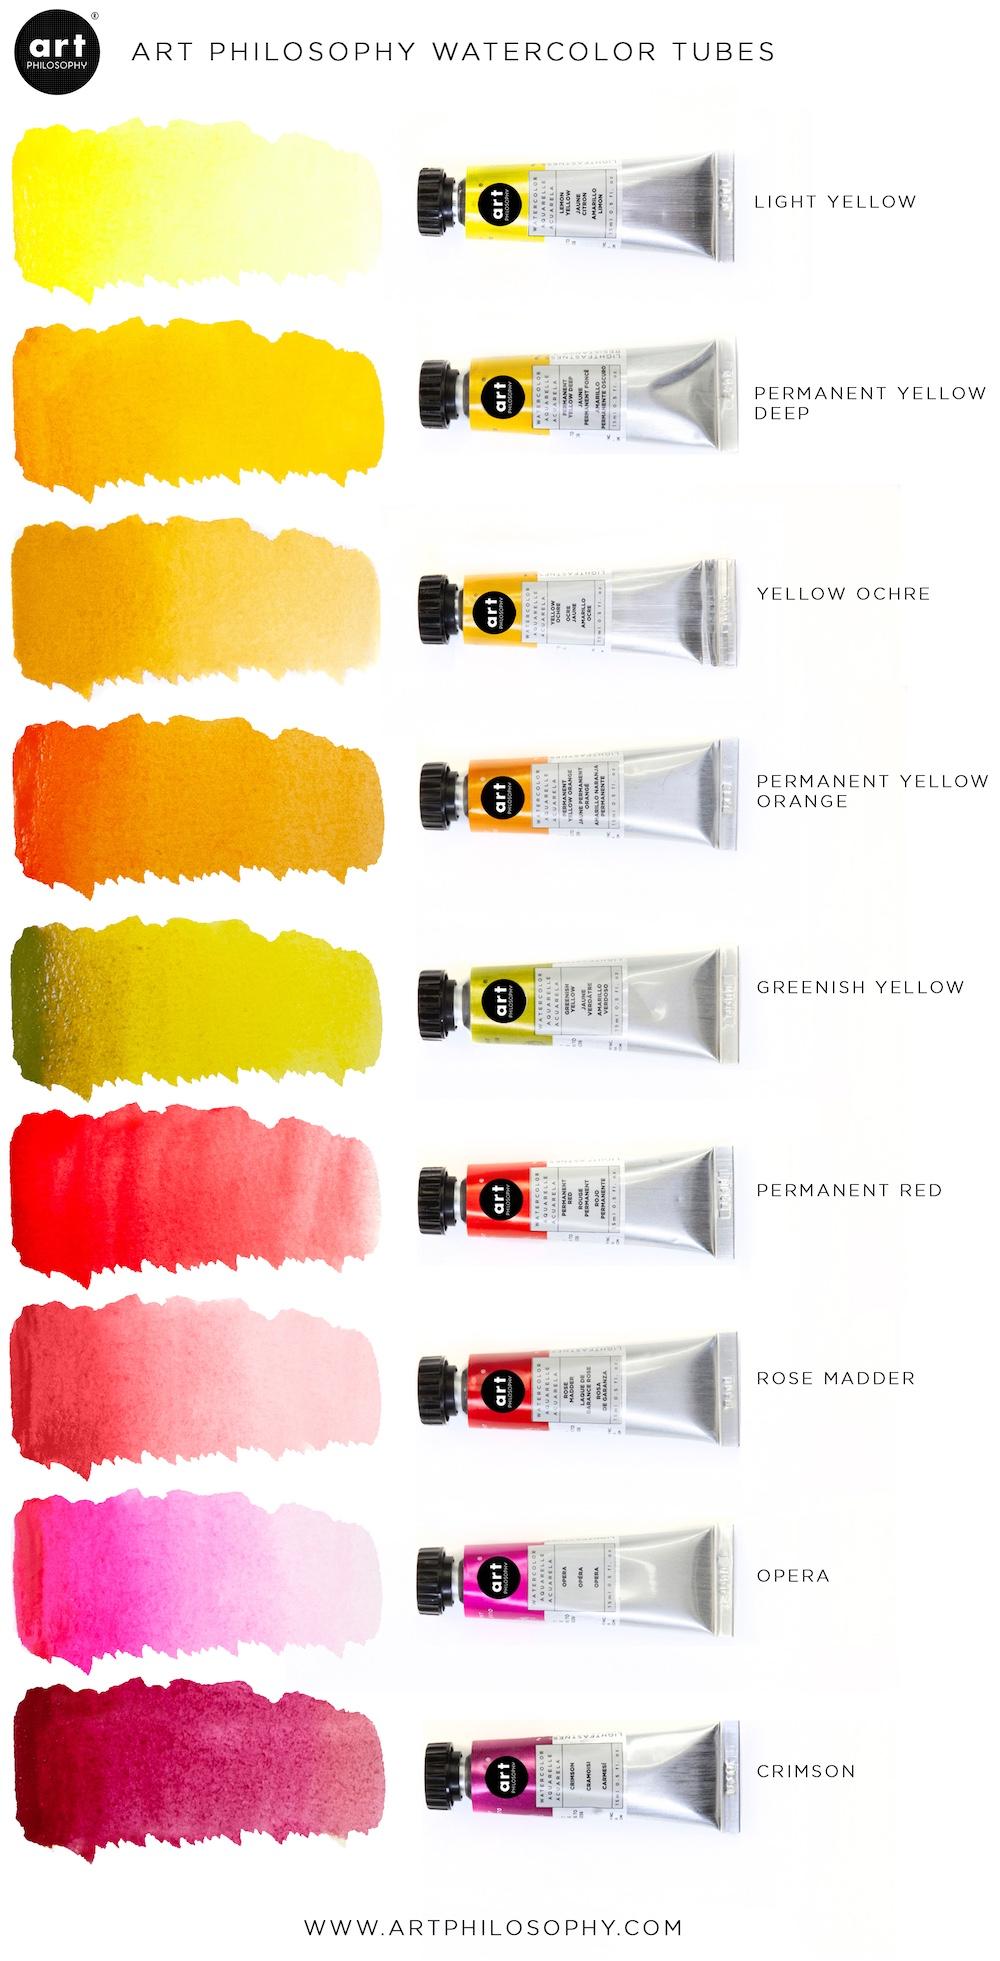 Art Philosophy® Artist Grade Watercolor Tubes - Permanent Red